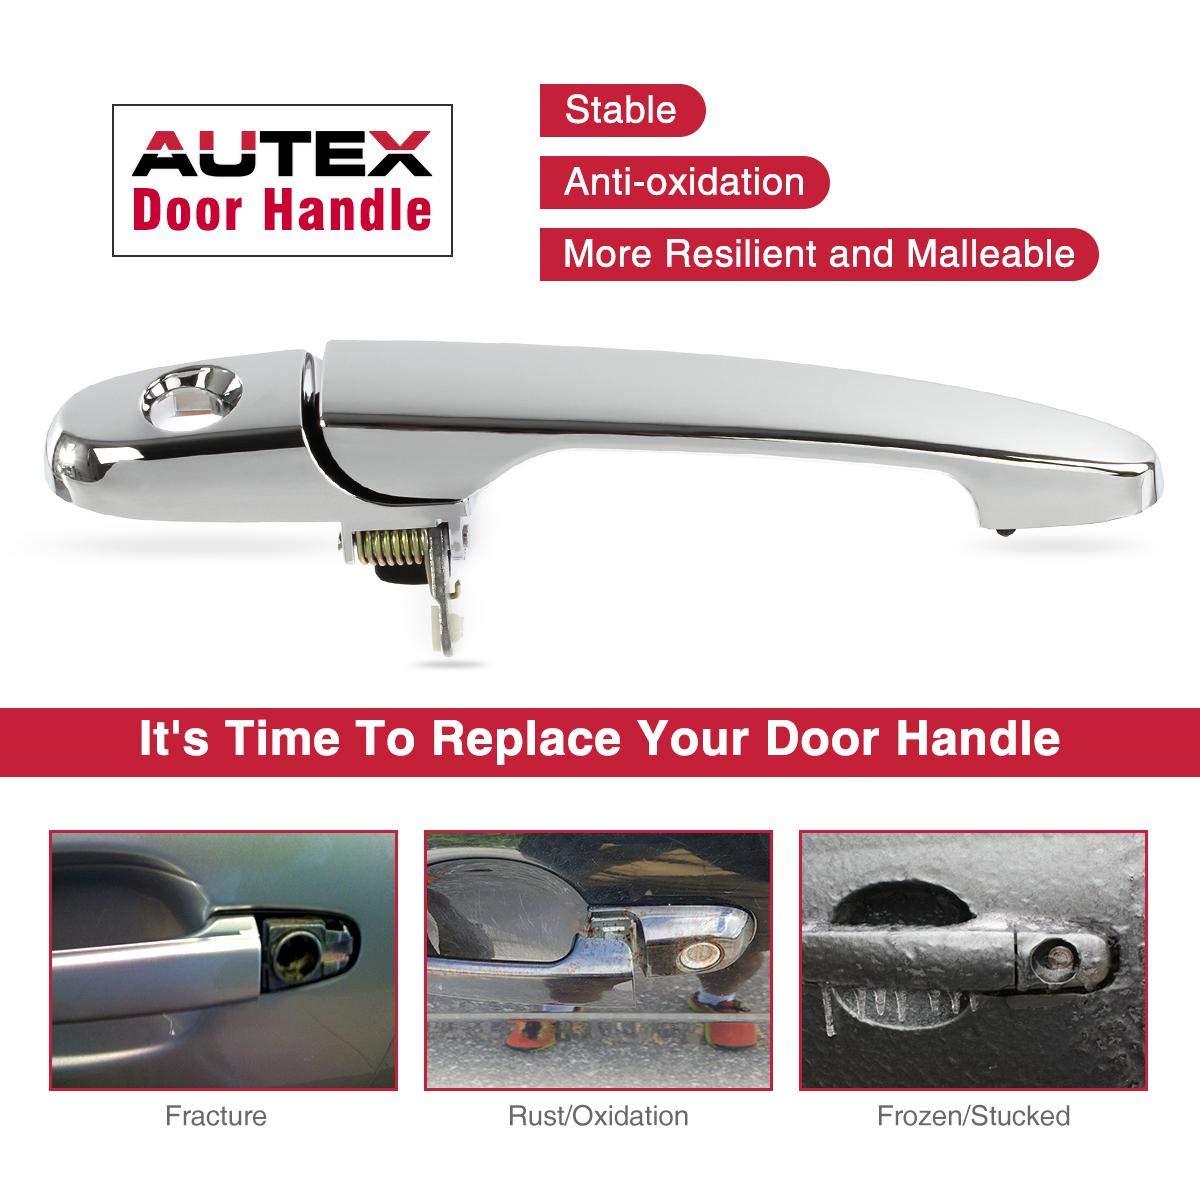 AUTEX Door Handle 80532 Chrome Exterior Front Left Driver Side Compatible with Buick LaCrosse,Pontiac Solstice G5 2005-2009 Replacement for Chevrolet Impala 07 08 09 10 11 12 13 Door Handle